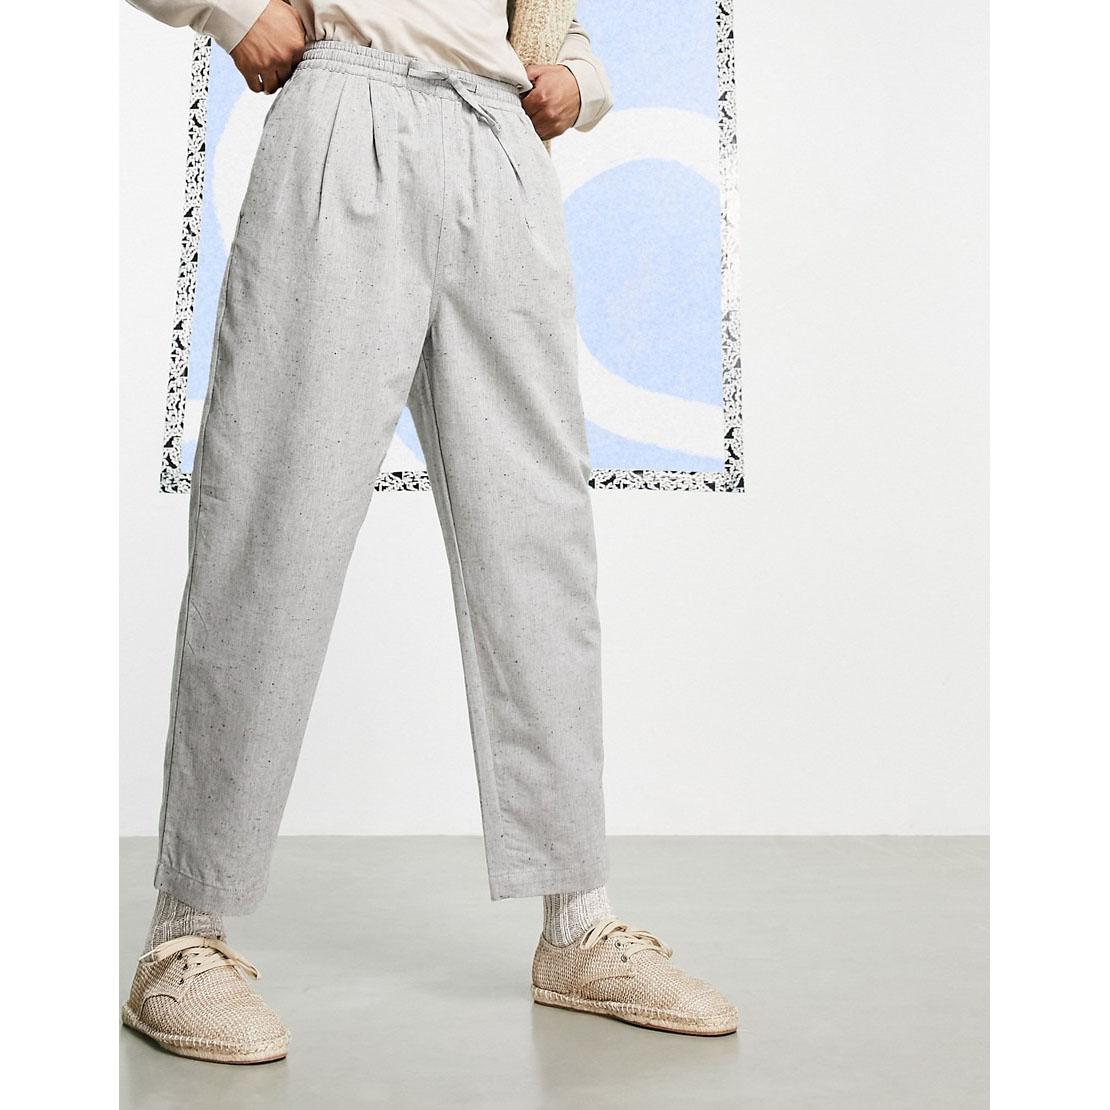 ASOS DESIGN Wide Fit Ankle Grazer Pants